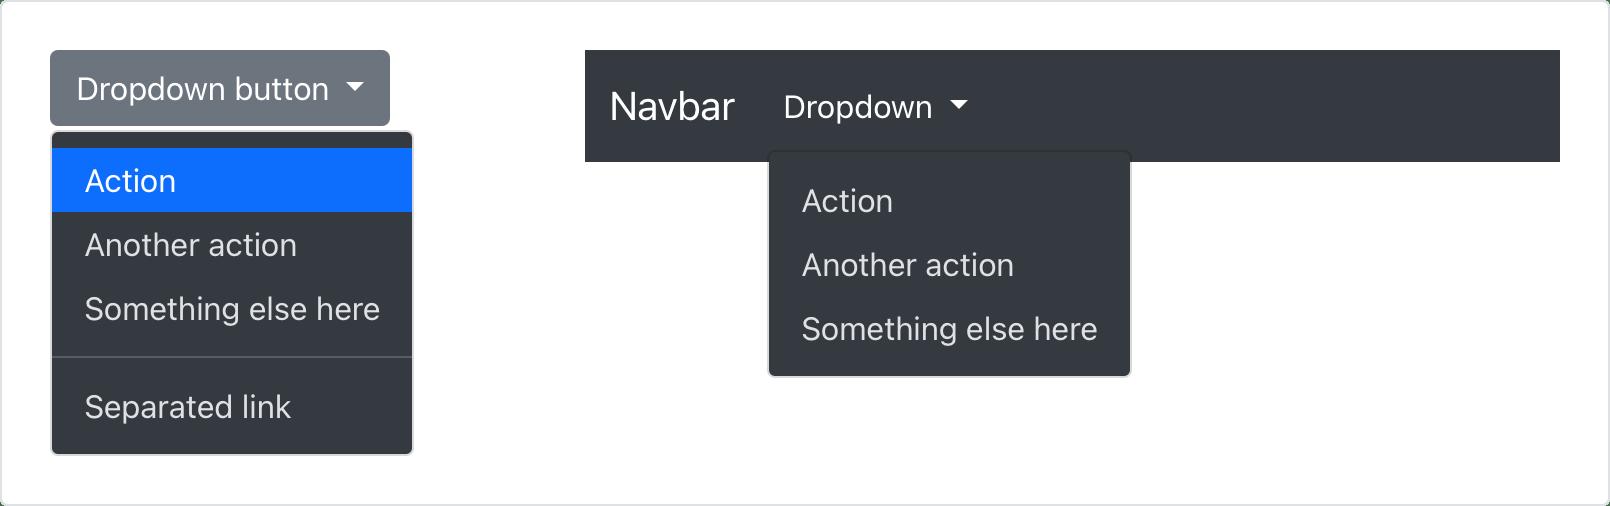 Example dark dropdowns